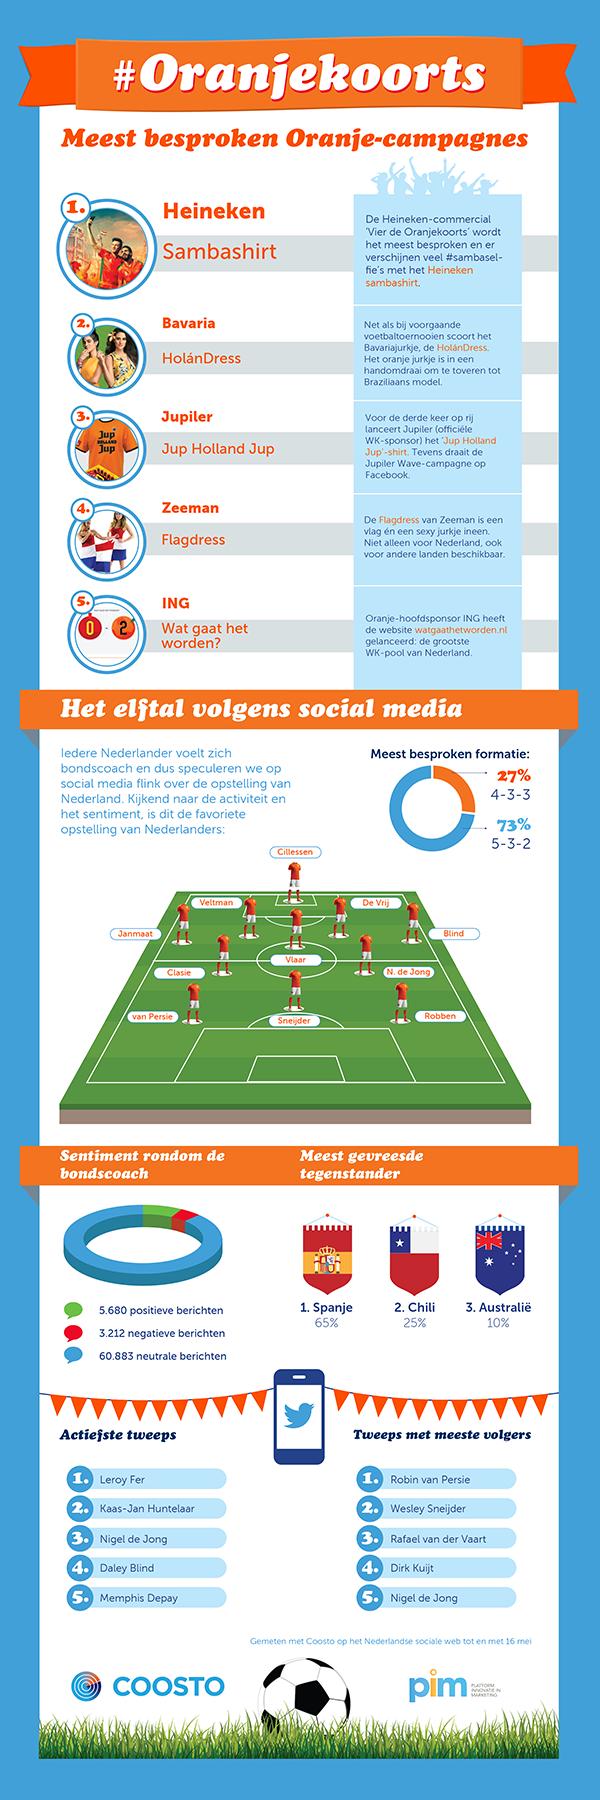 Infographic Oranjekoorts